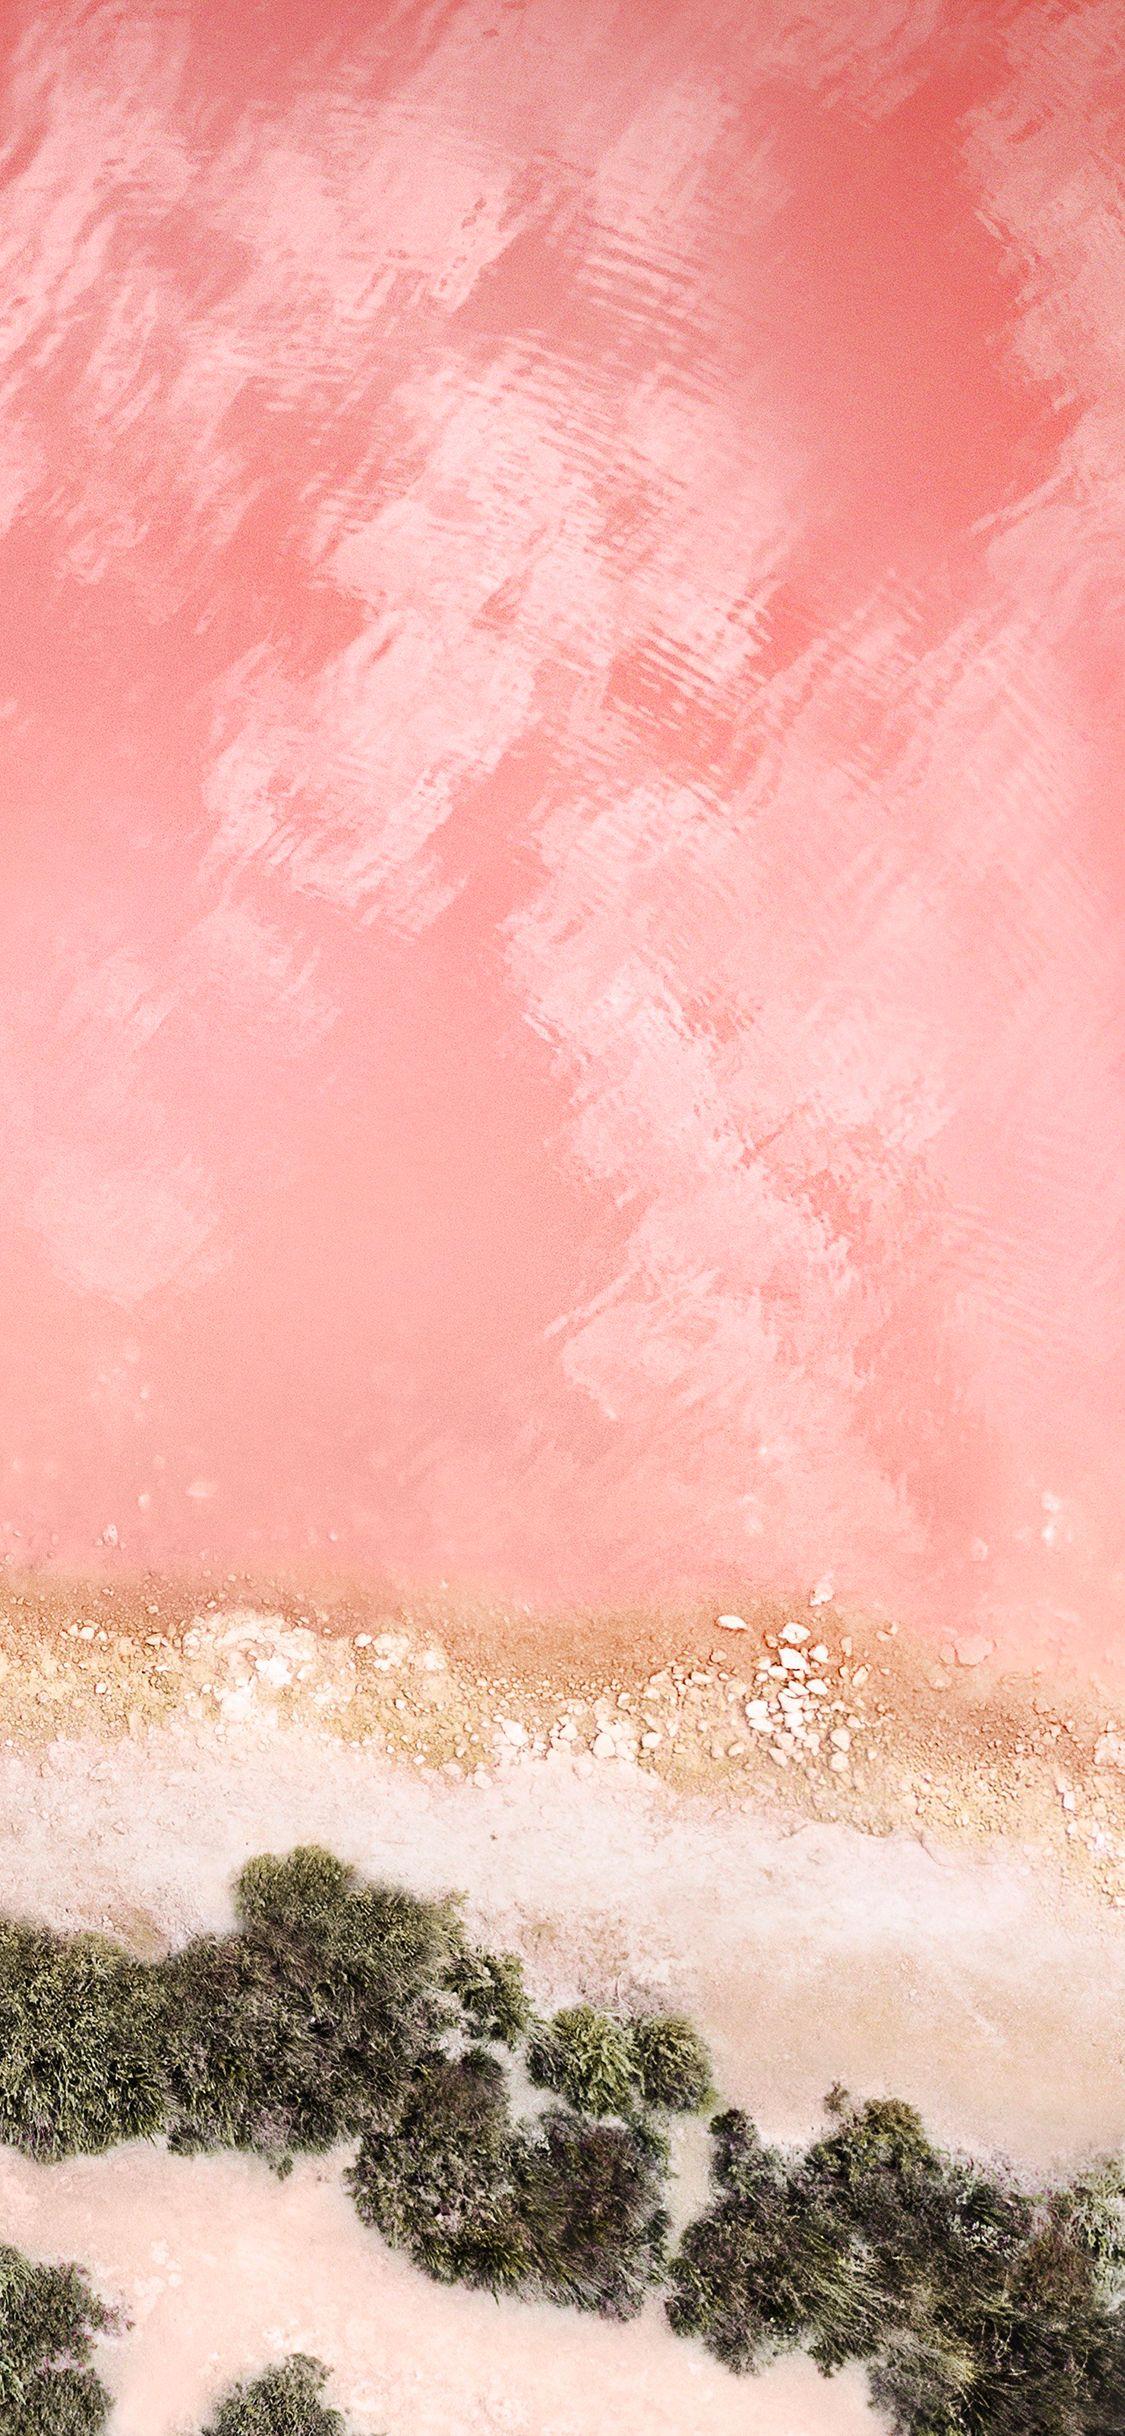 Original Apple Wallpapers Optimized For Iphone X - Pink Iphone X Background , HD Wallpaper & Backgrounds